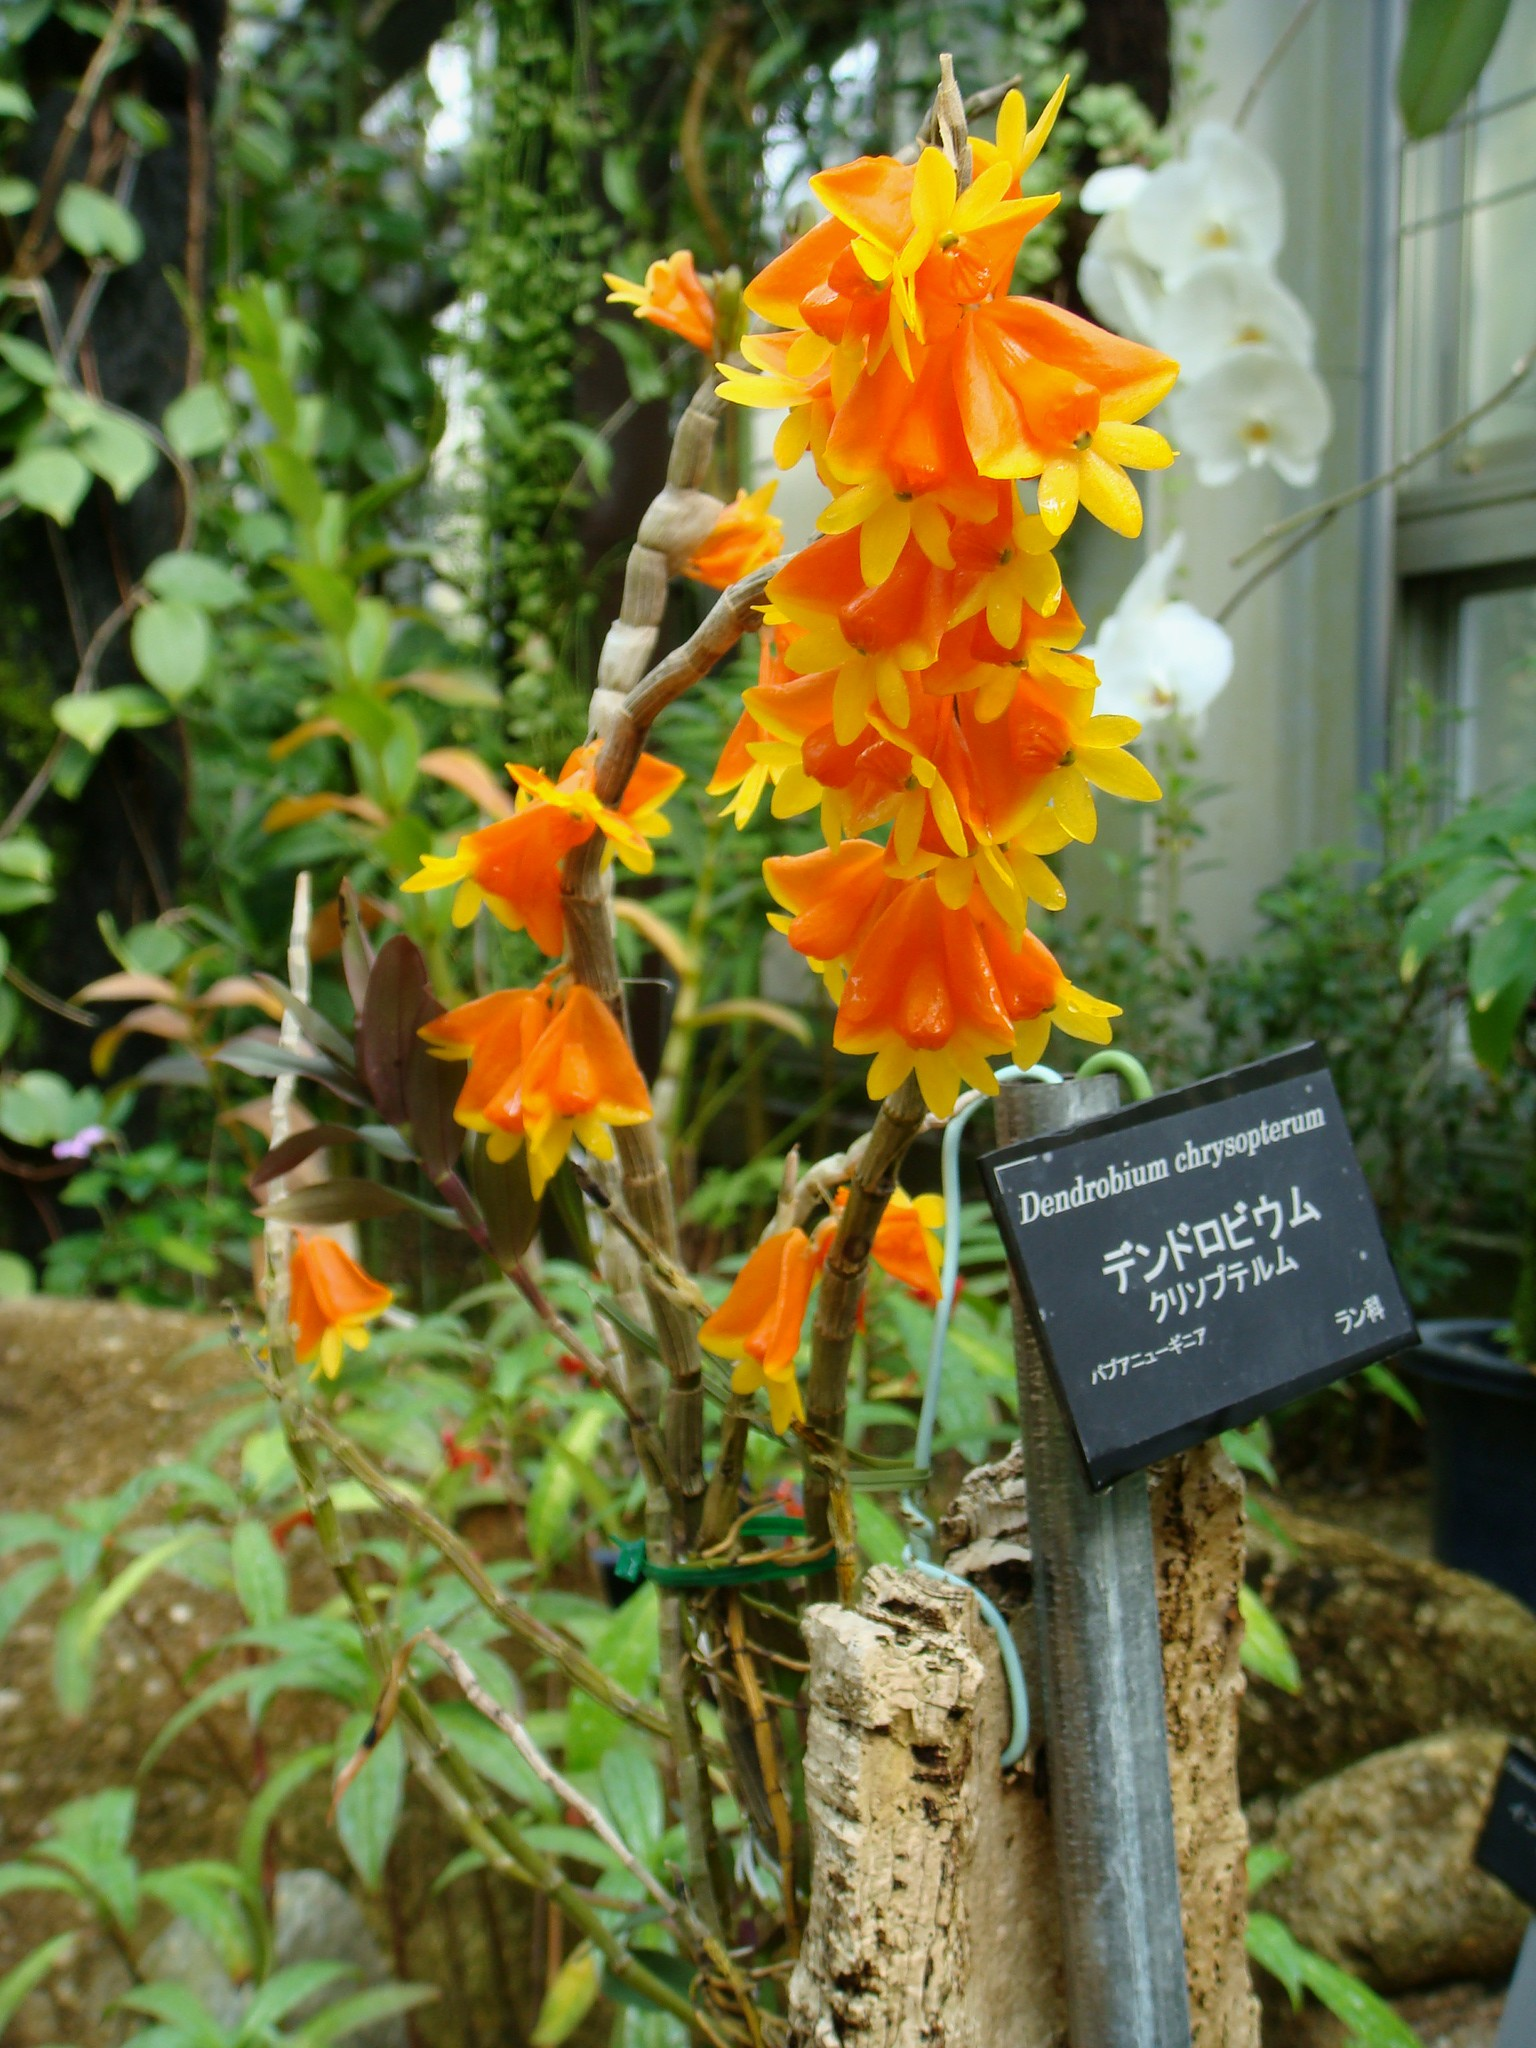 http://orchids.la.coocan.jp/Dendrobium/Dendrobium%20chrysopterum/DSC04517.JPG